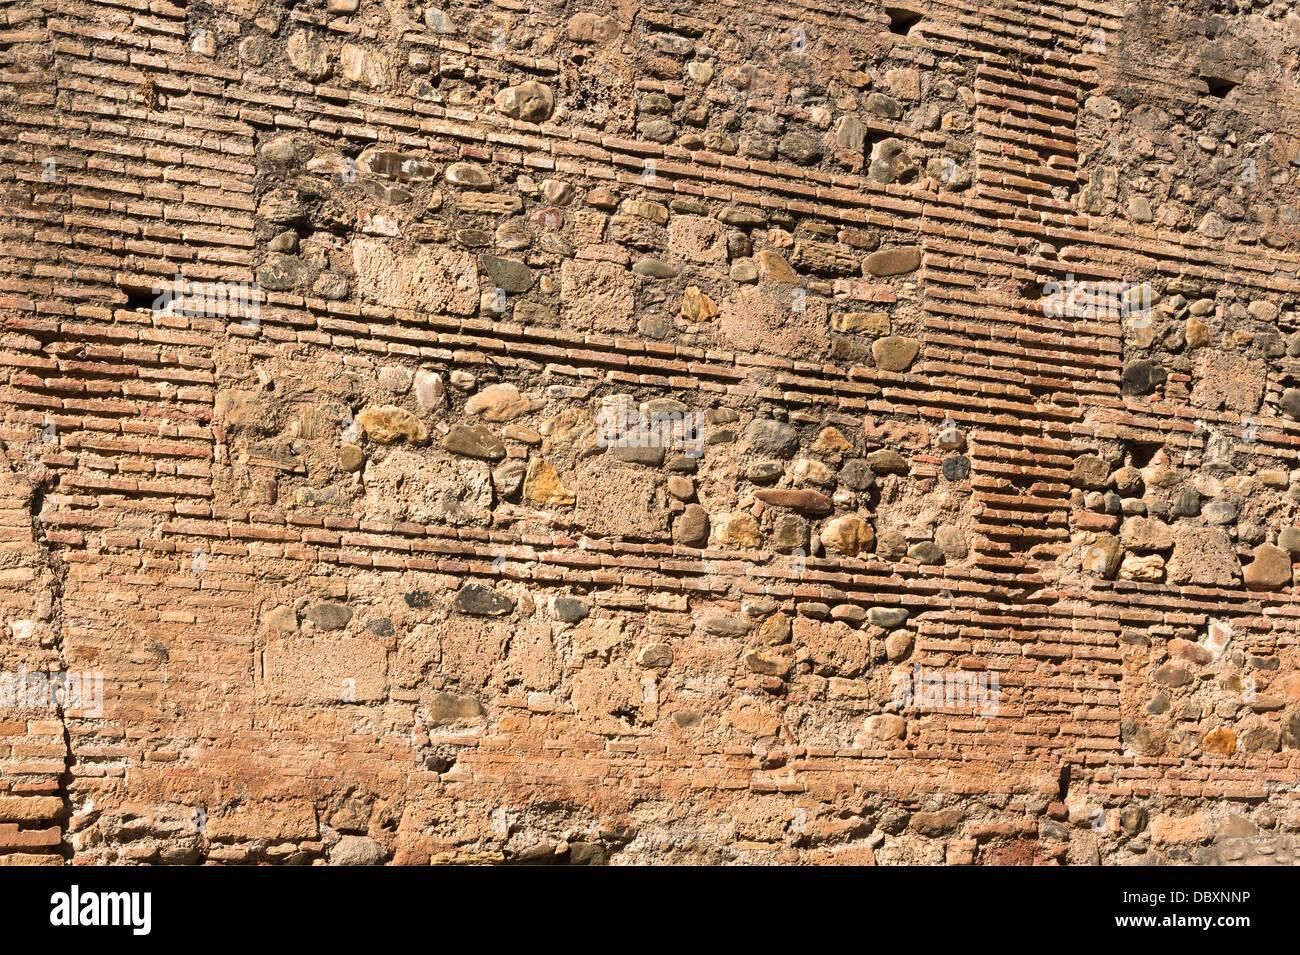 Sample of arab masonry, 13th-century, Alhambra, Granada, Spain. - Stock Image